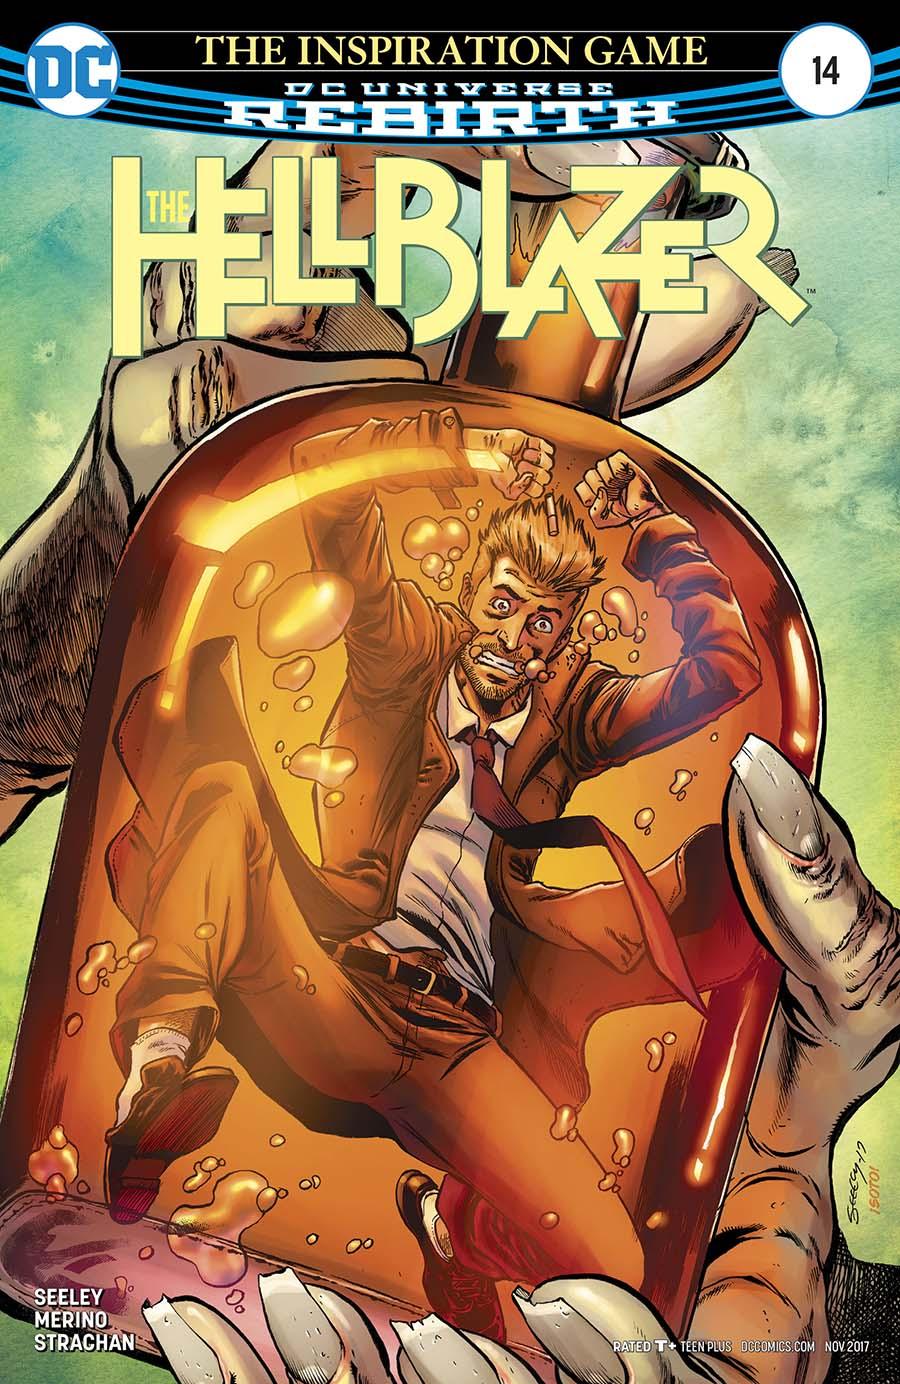 Hellblazer Vol 2 #14 Cover A Regular Tim Seeley Cover